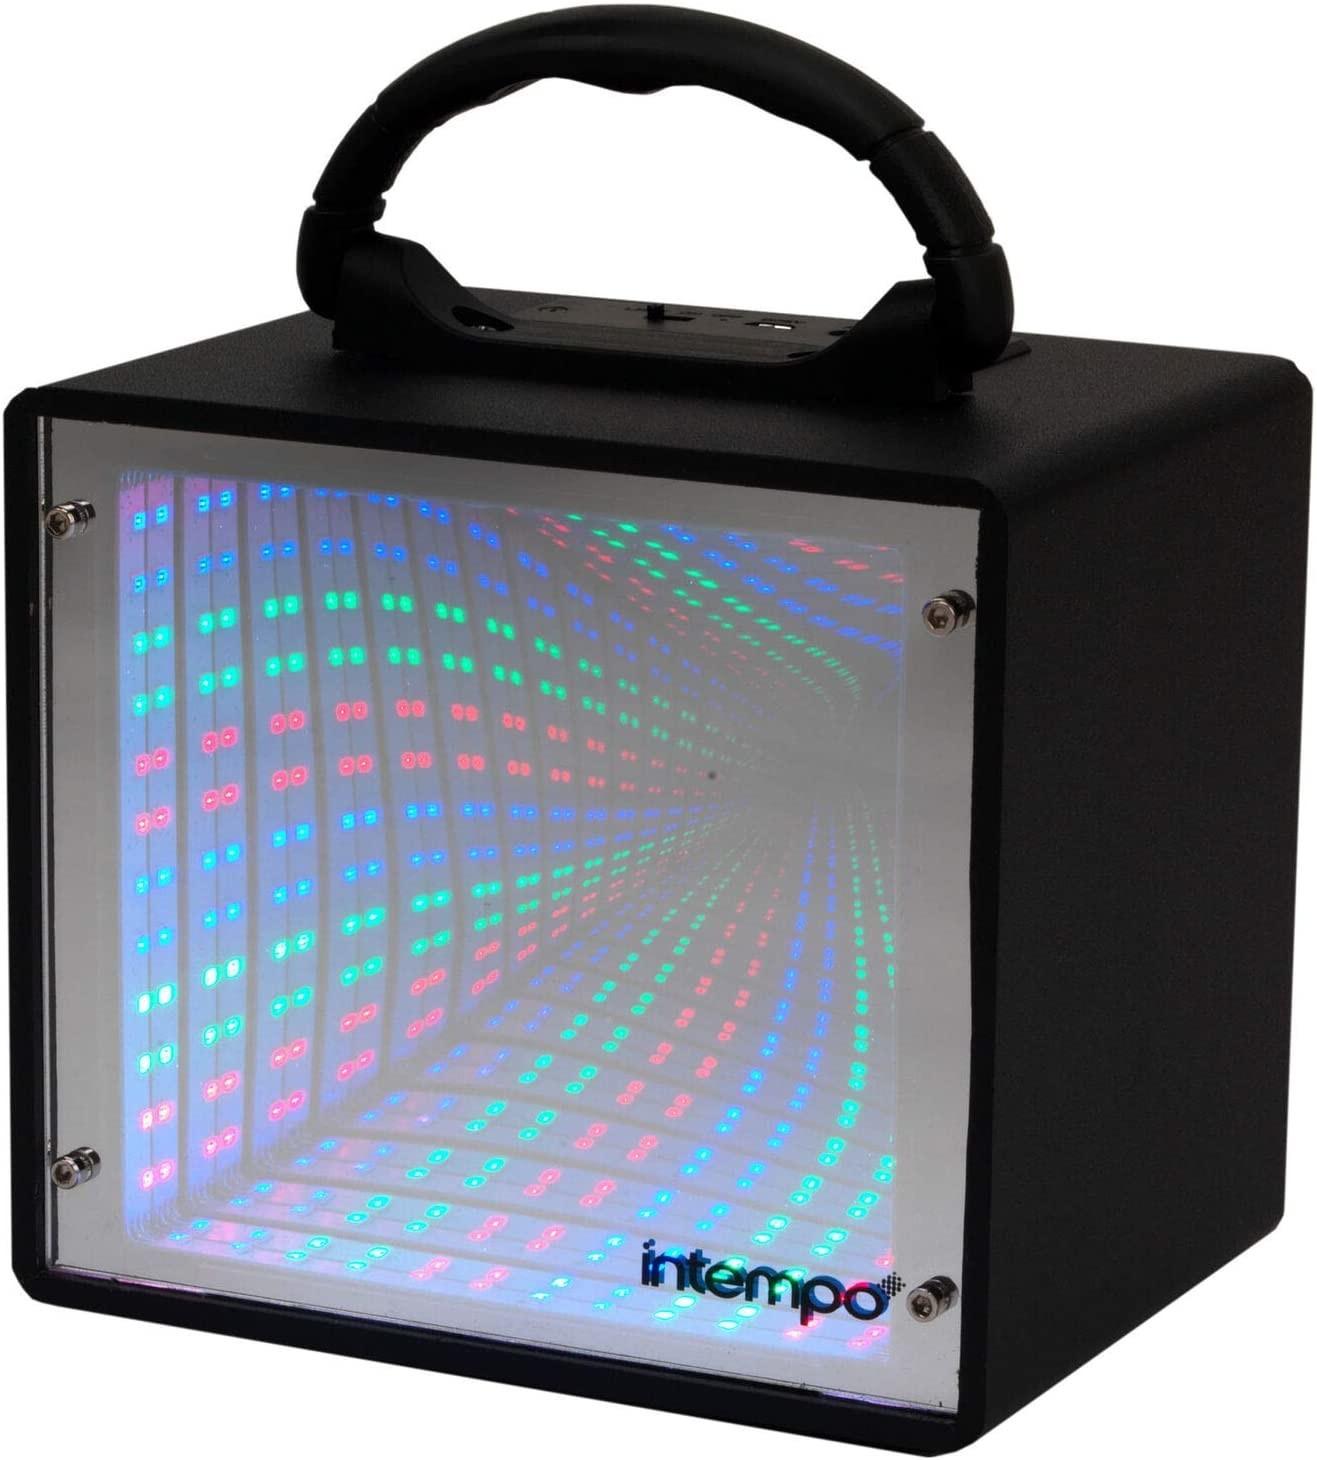 Image of Intempo Infinity Light LED Tunnel Speaker